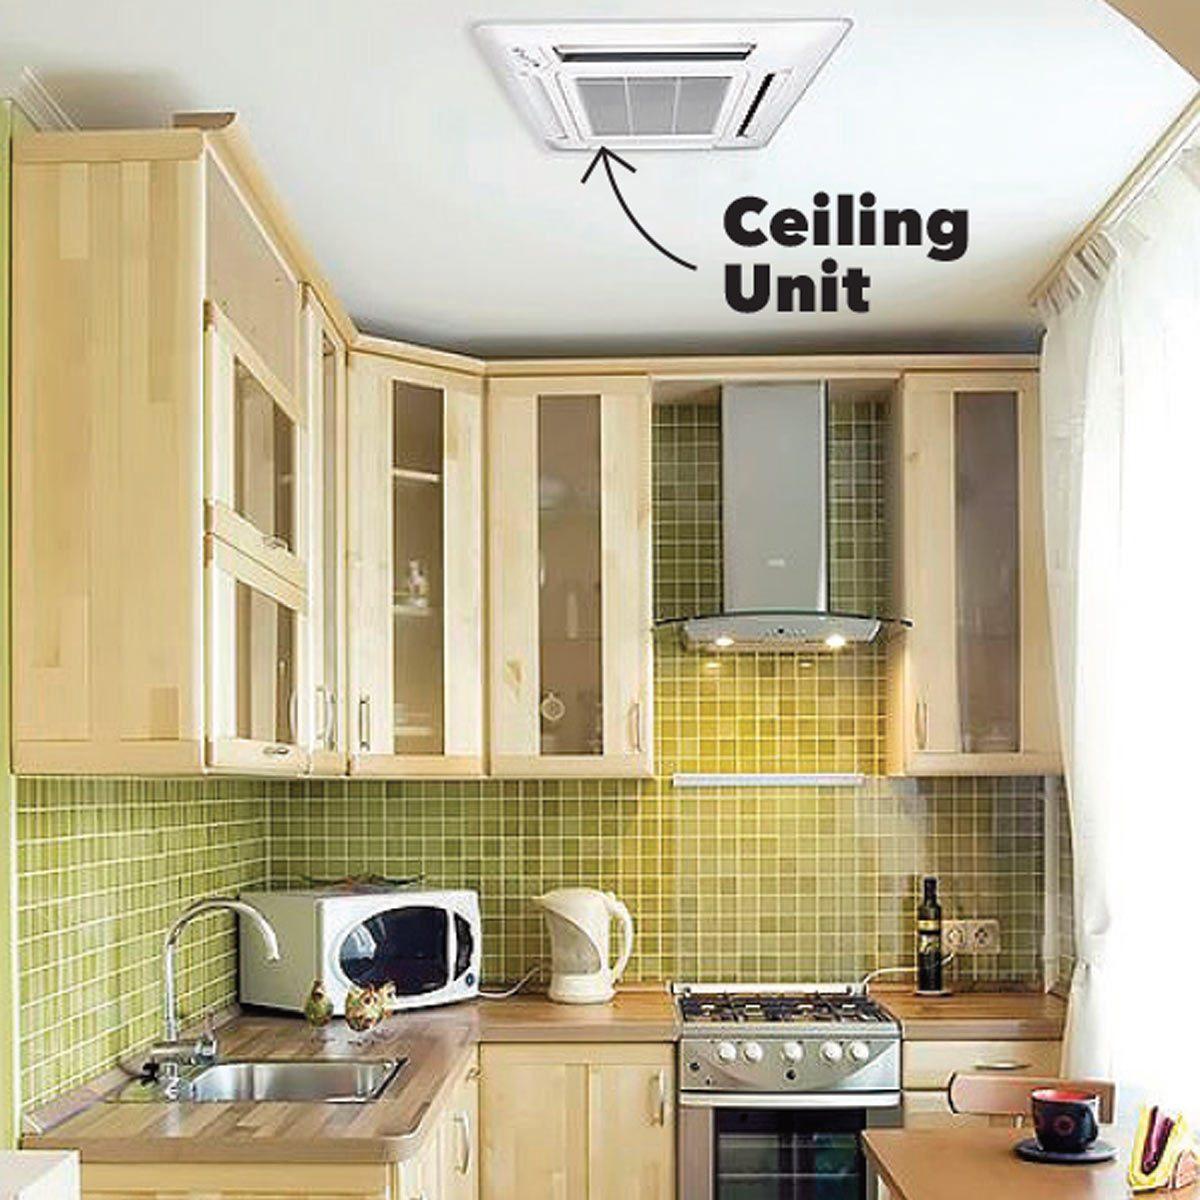 ceiling mini-split unit kitchen